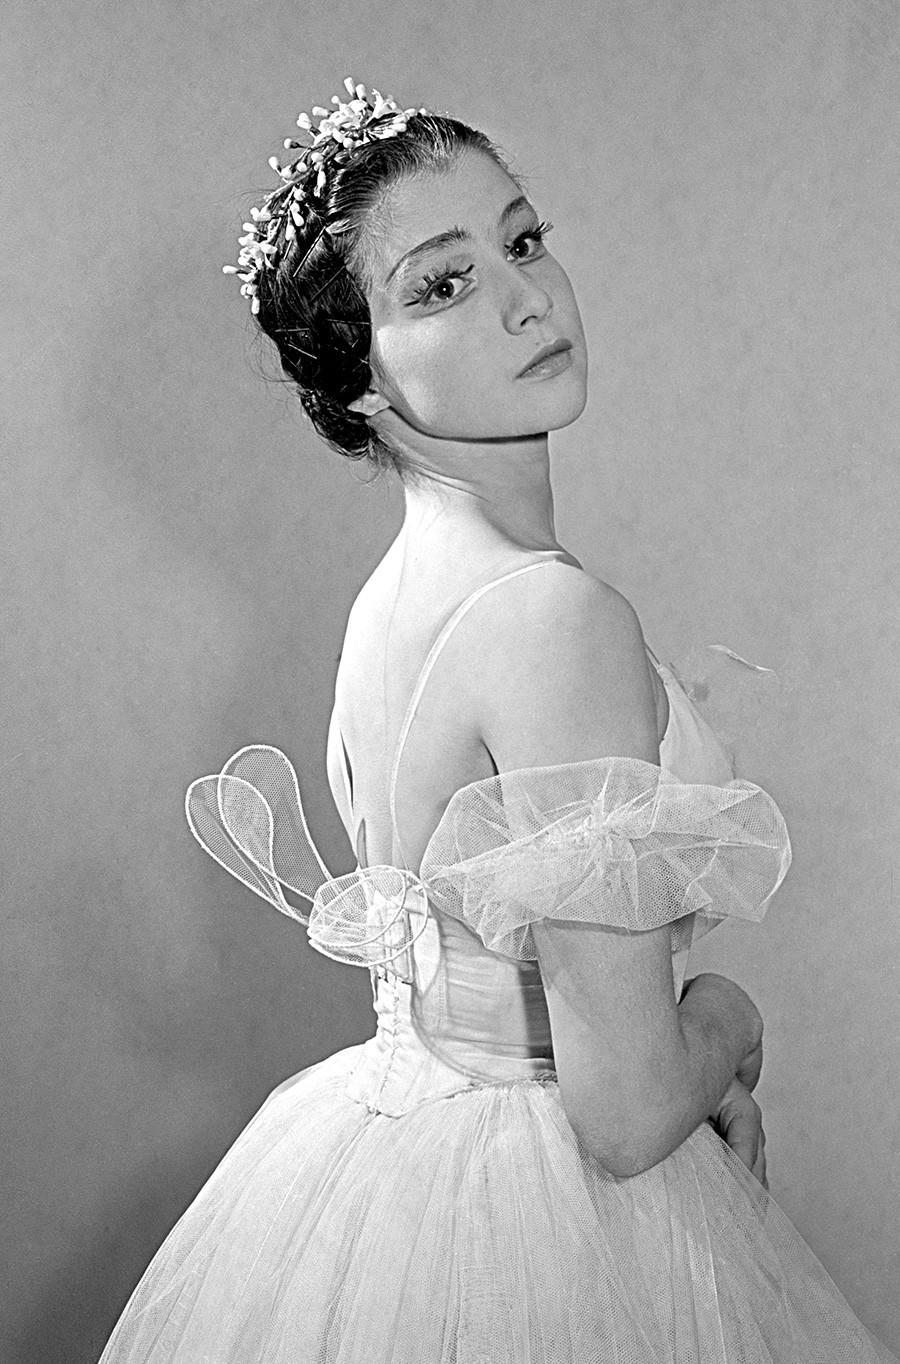 Екатерина Максимова, 1961.